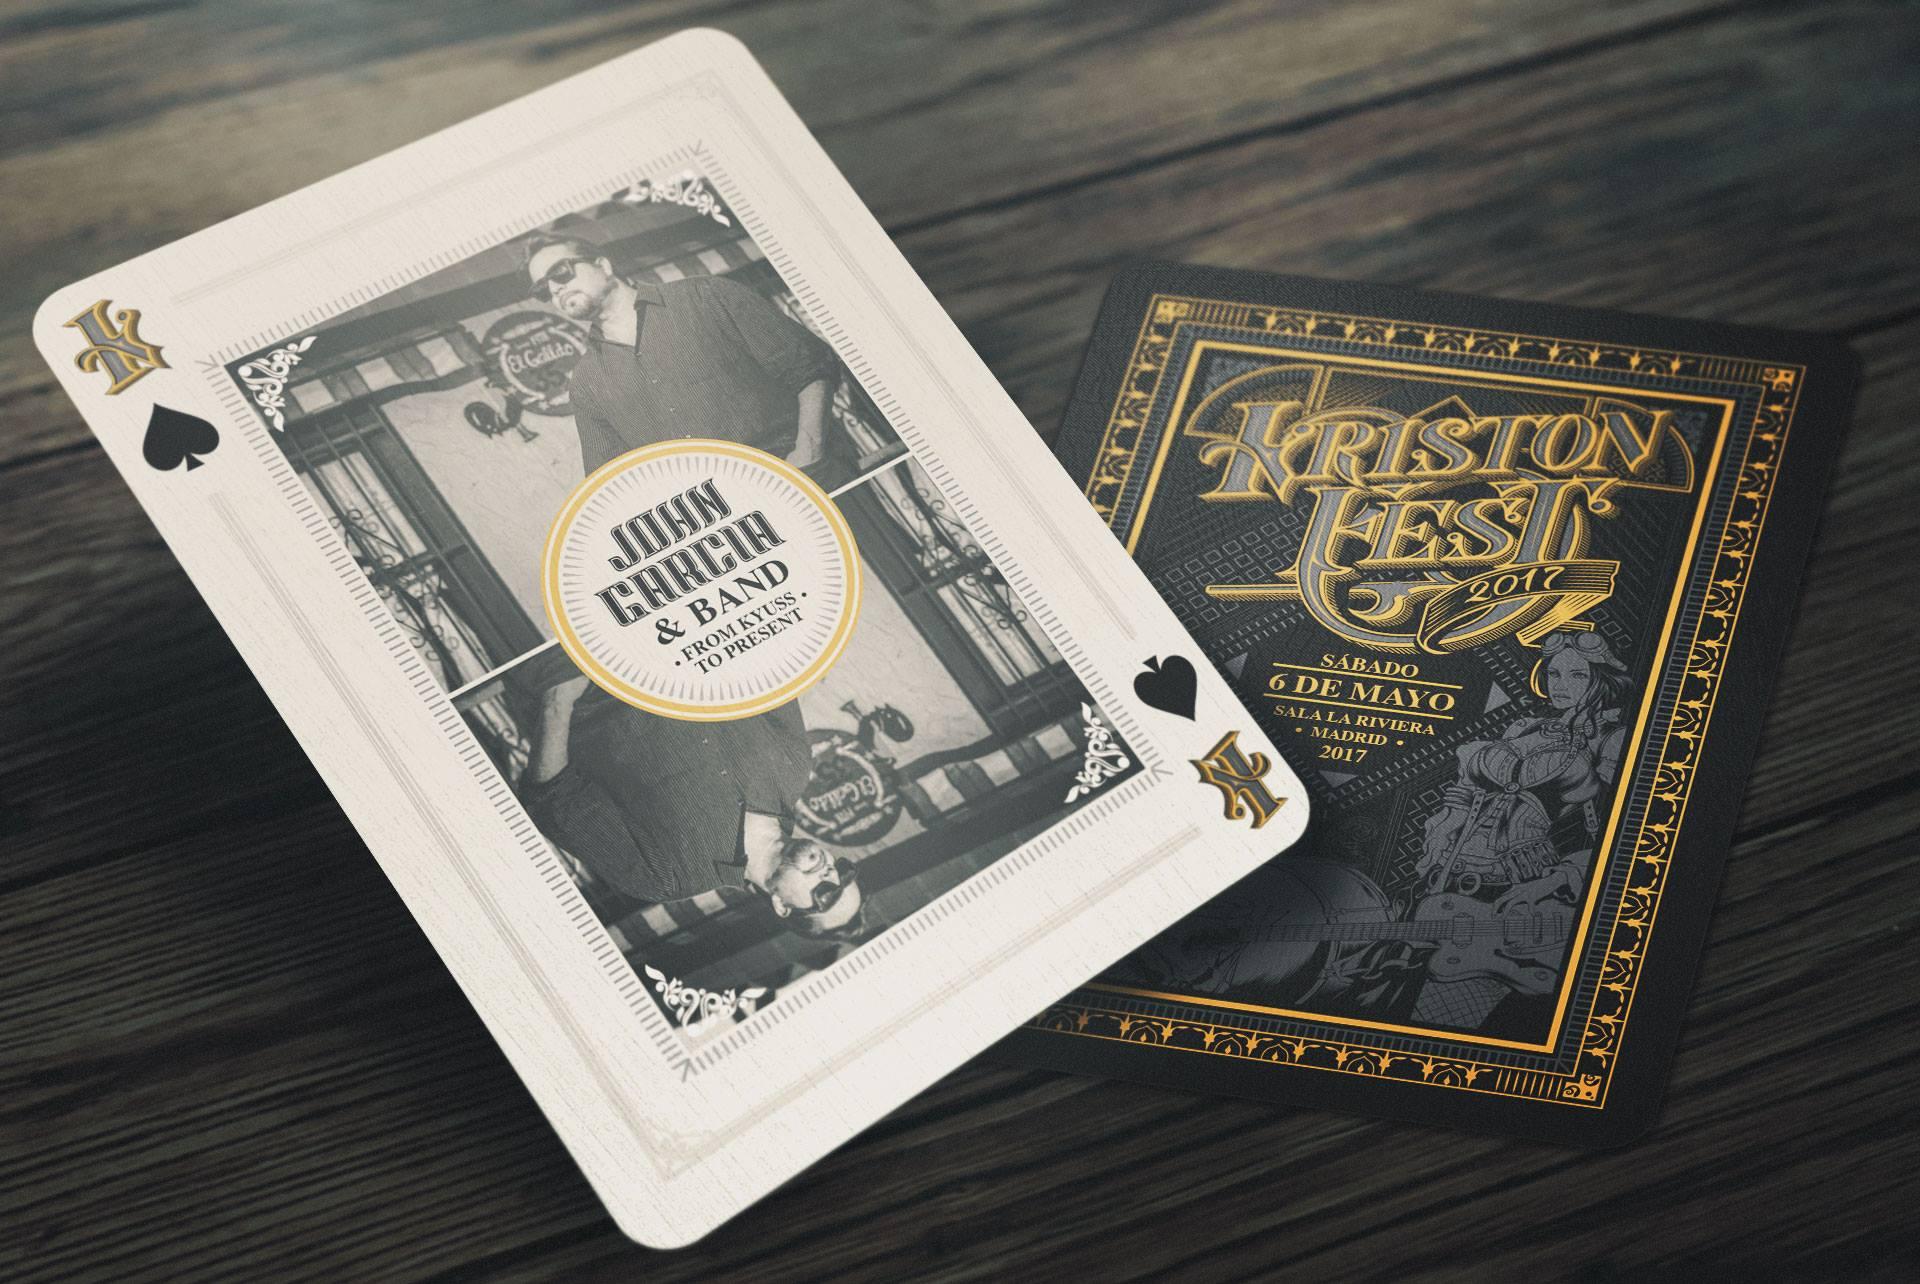 kristonfest cover